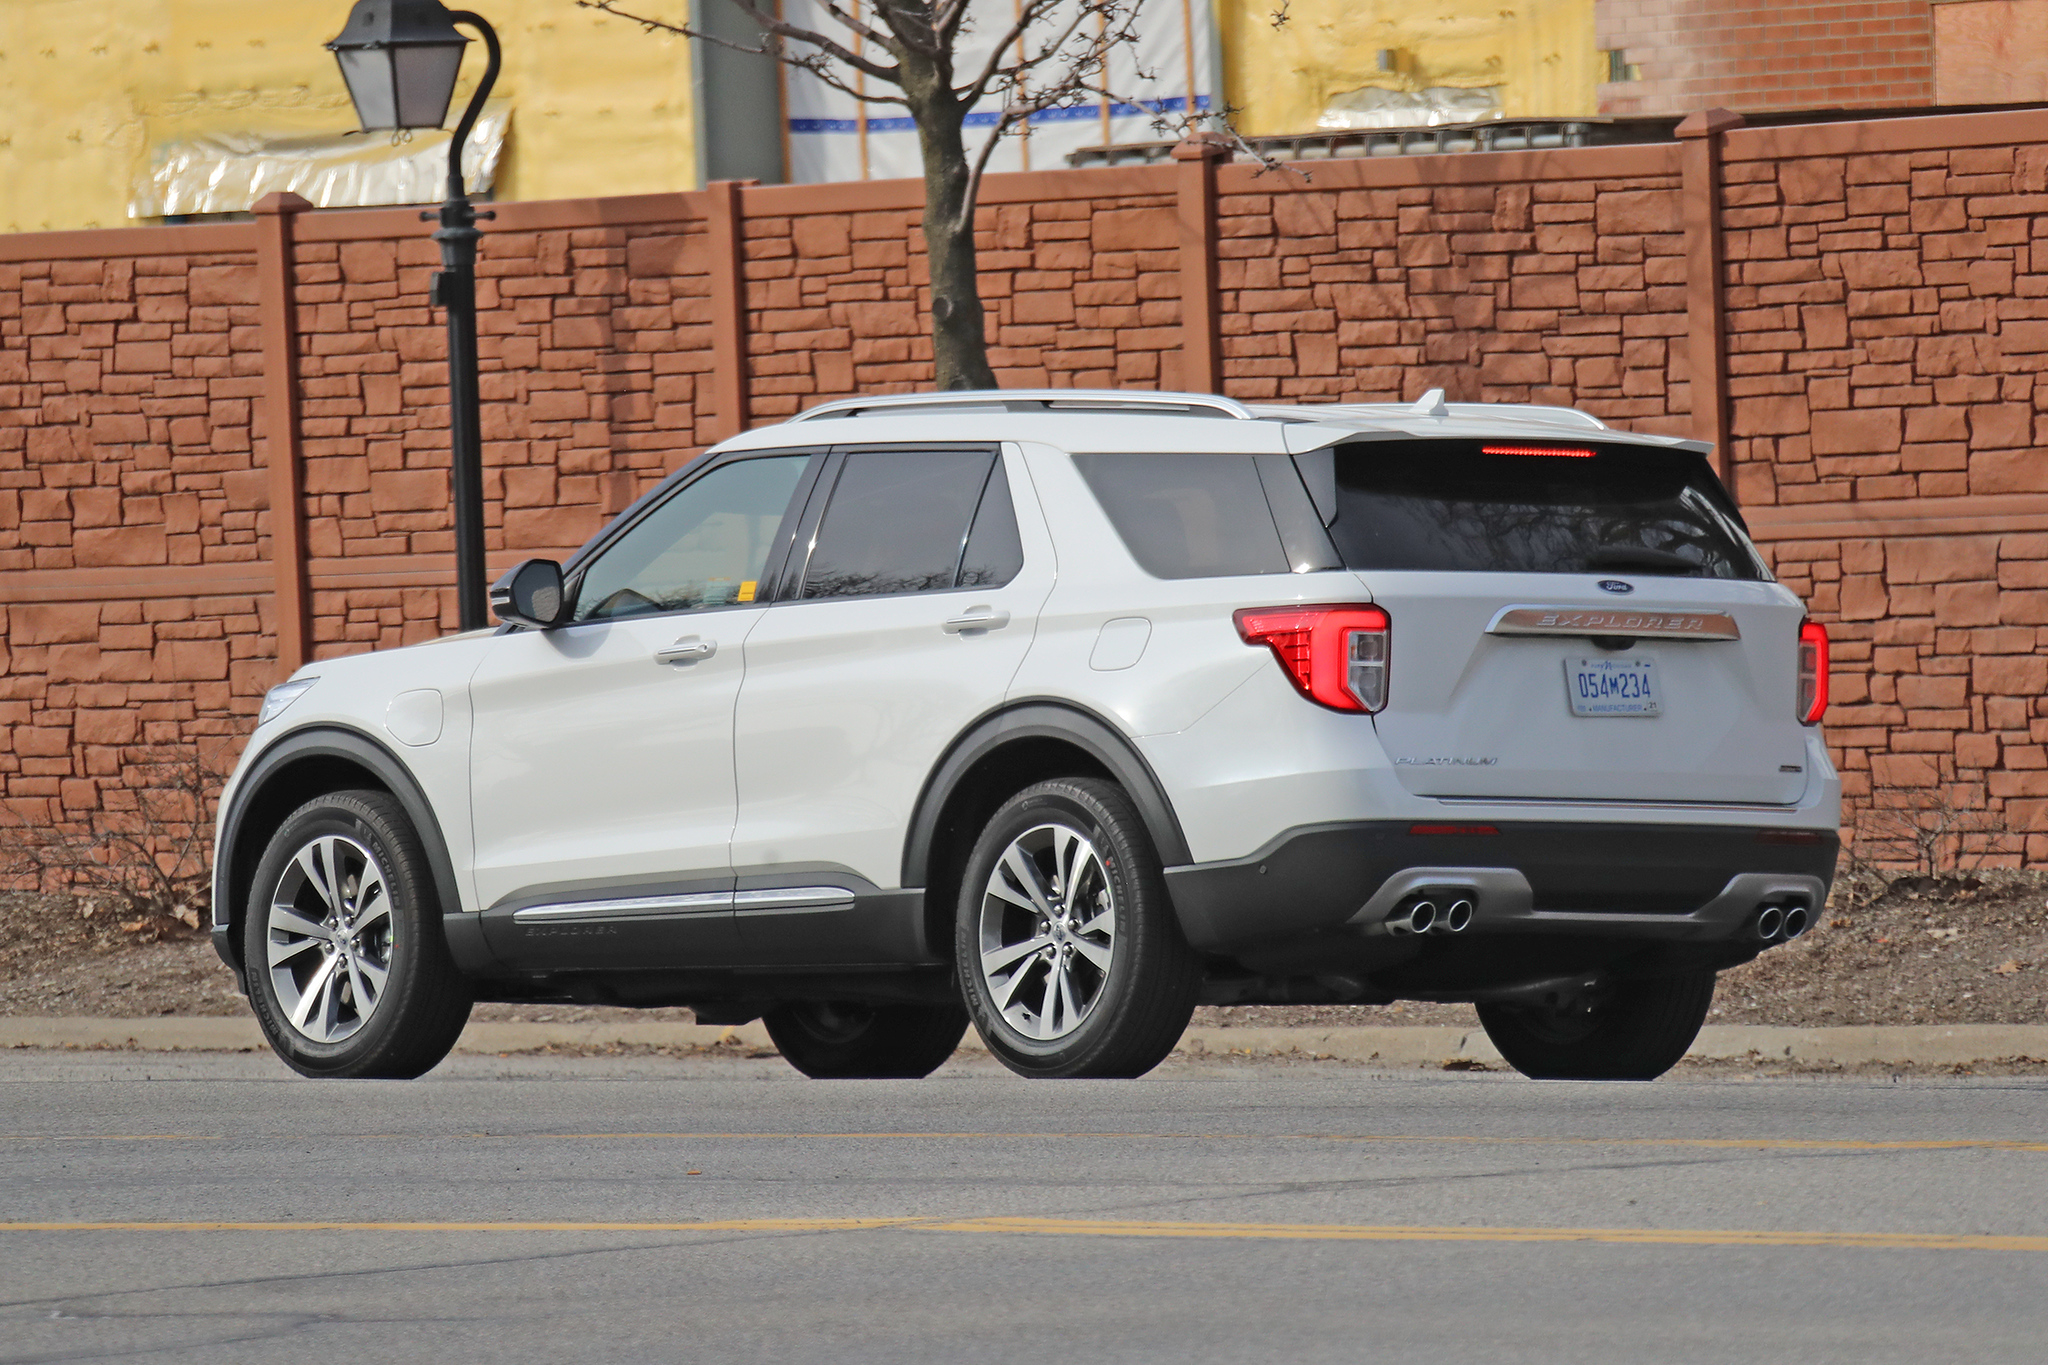 2021 Ford Explored PHEV